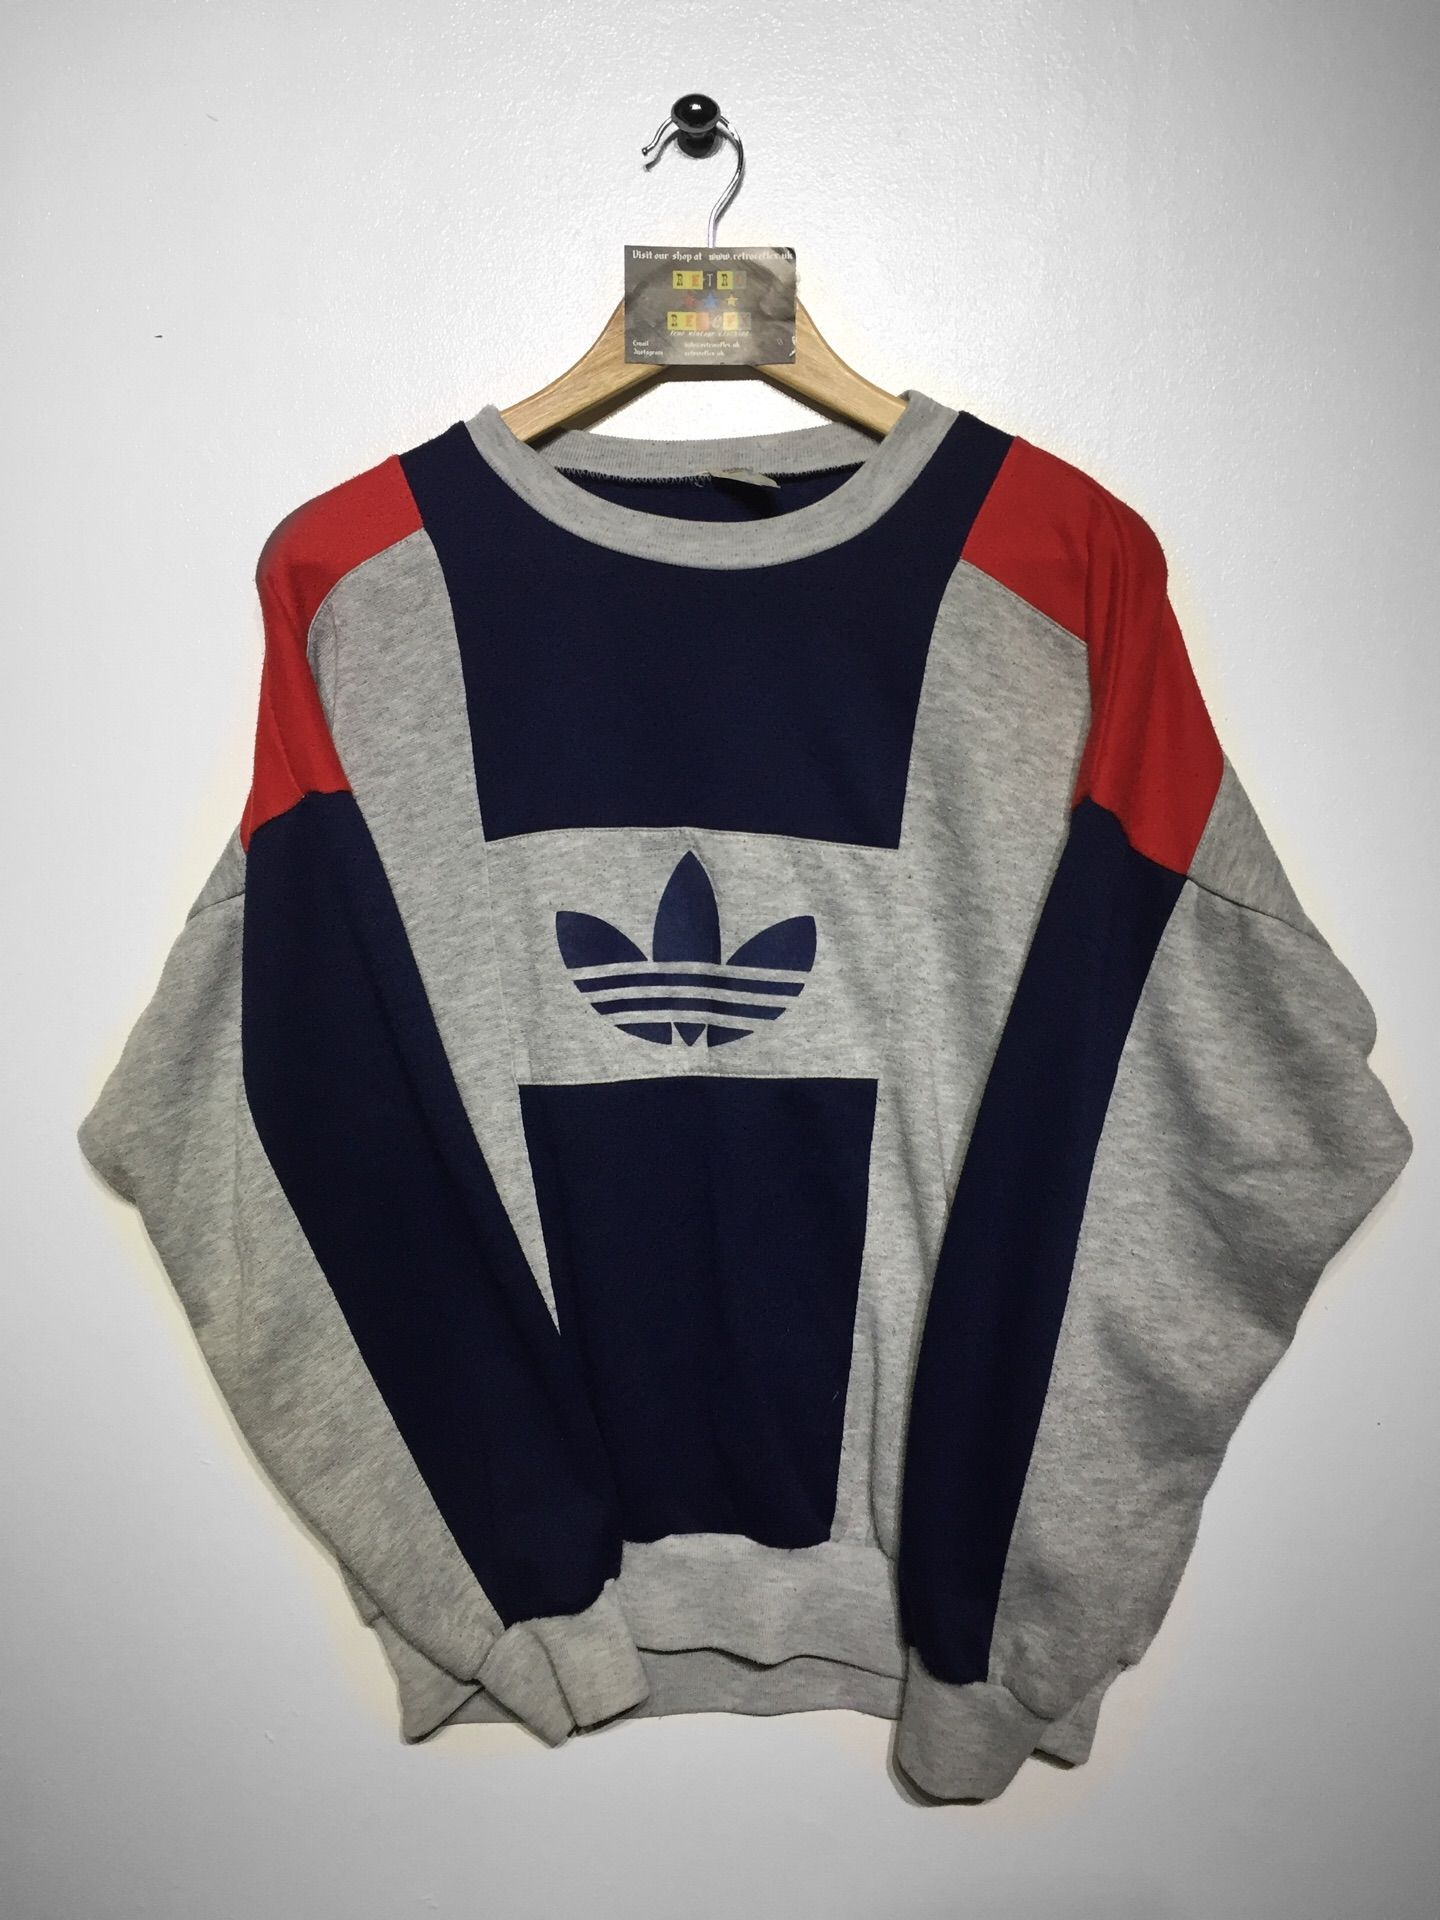 Adidas sweatshirt size Large £32 Website➡️ retroreflex